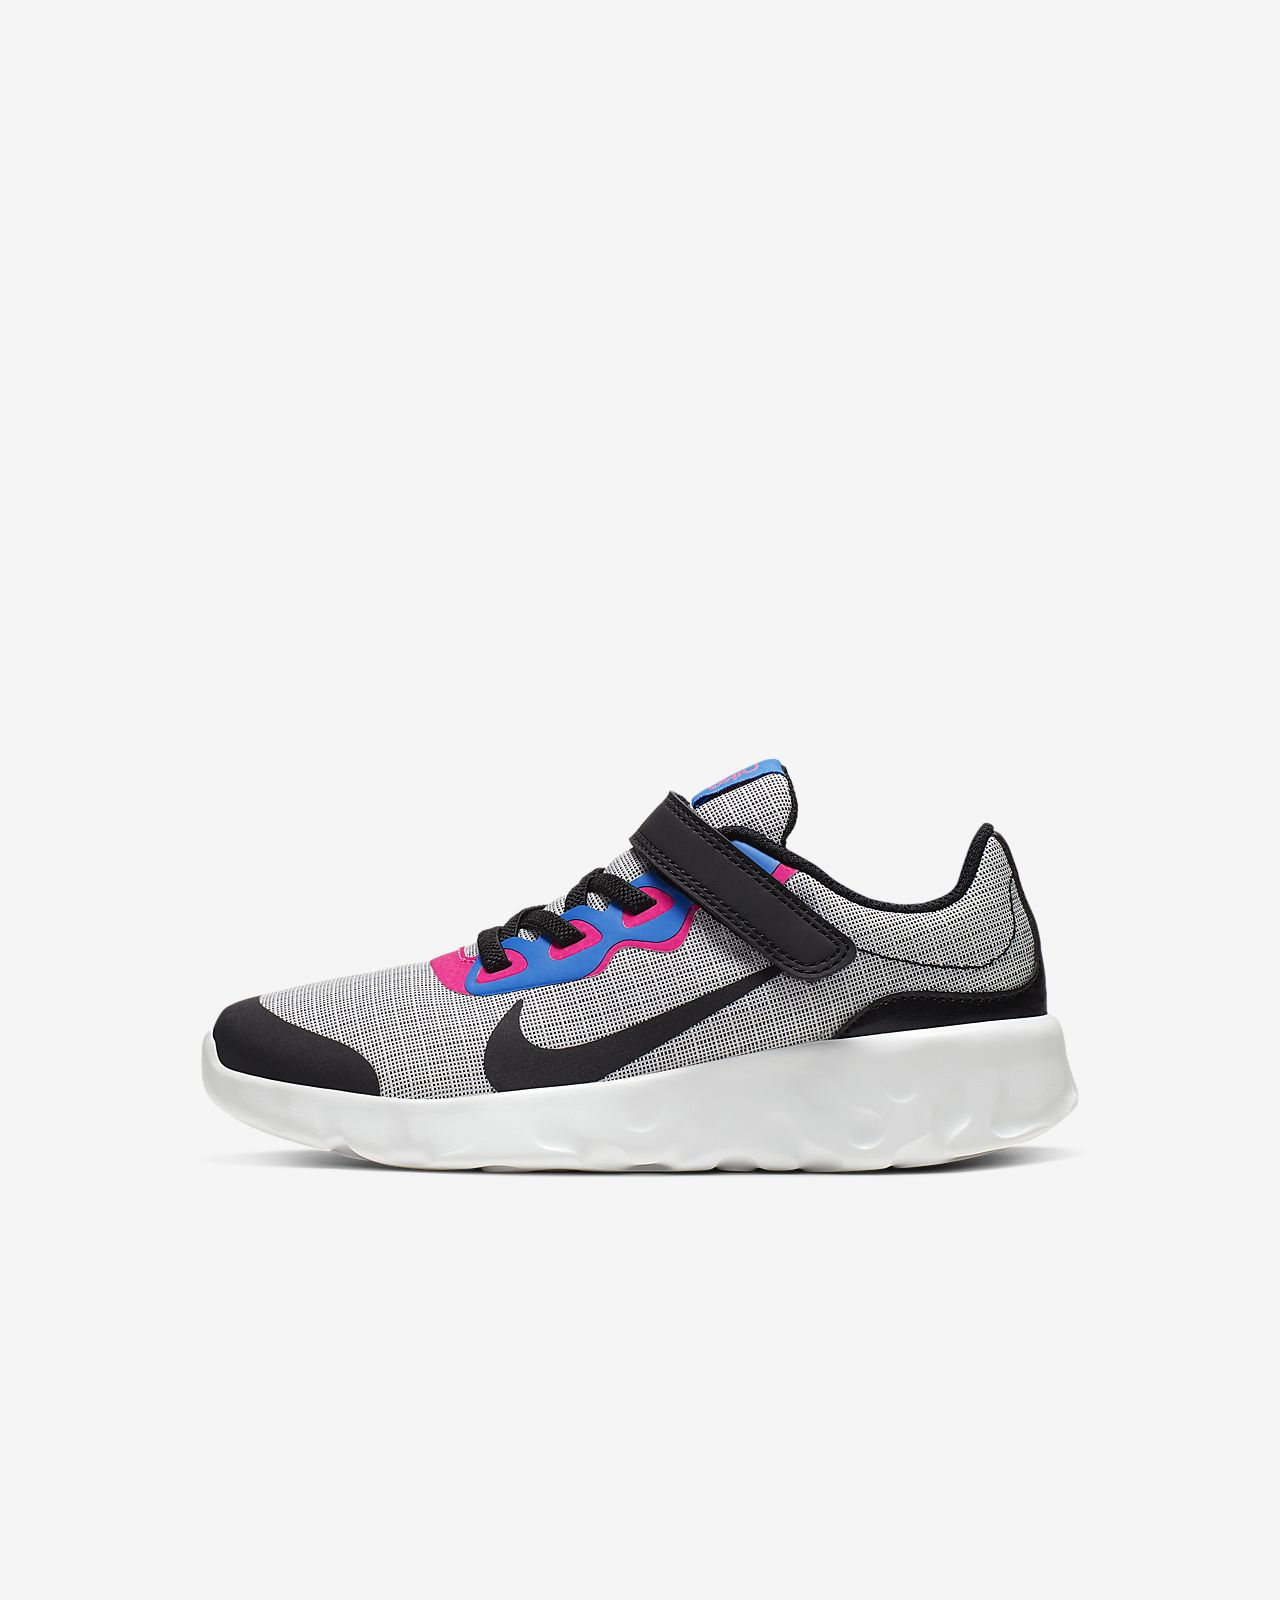 Kinder Schuh Explore jüngere Strada für Nike qUVzpSM